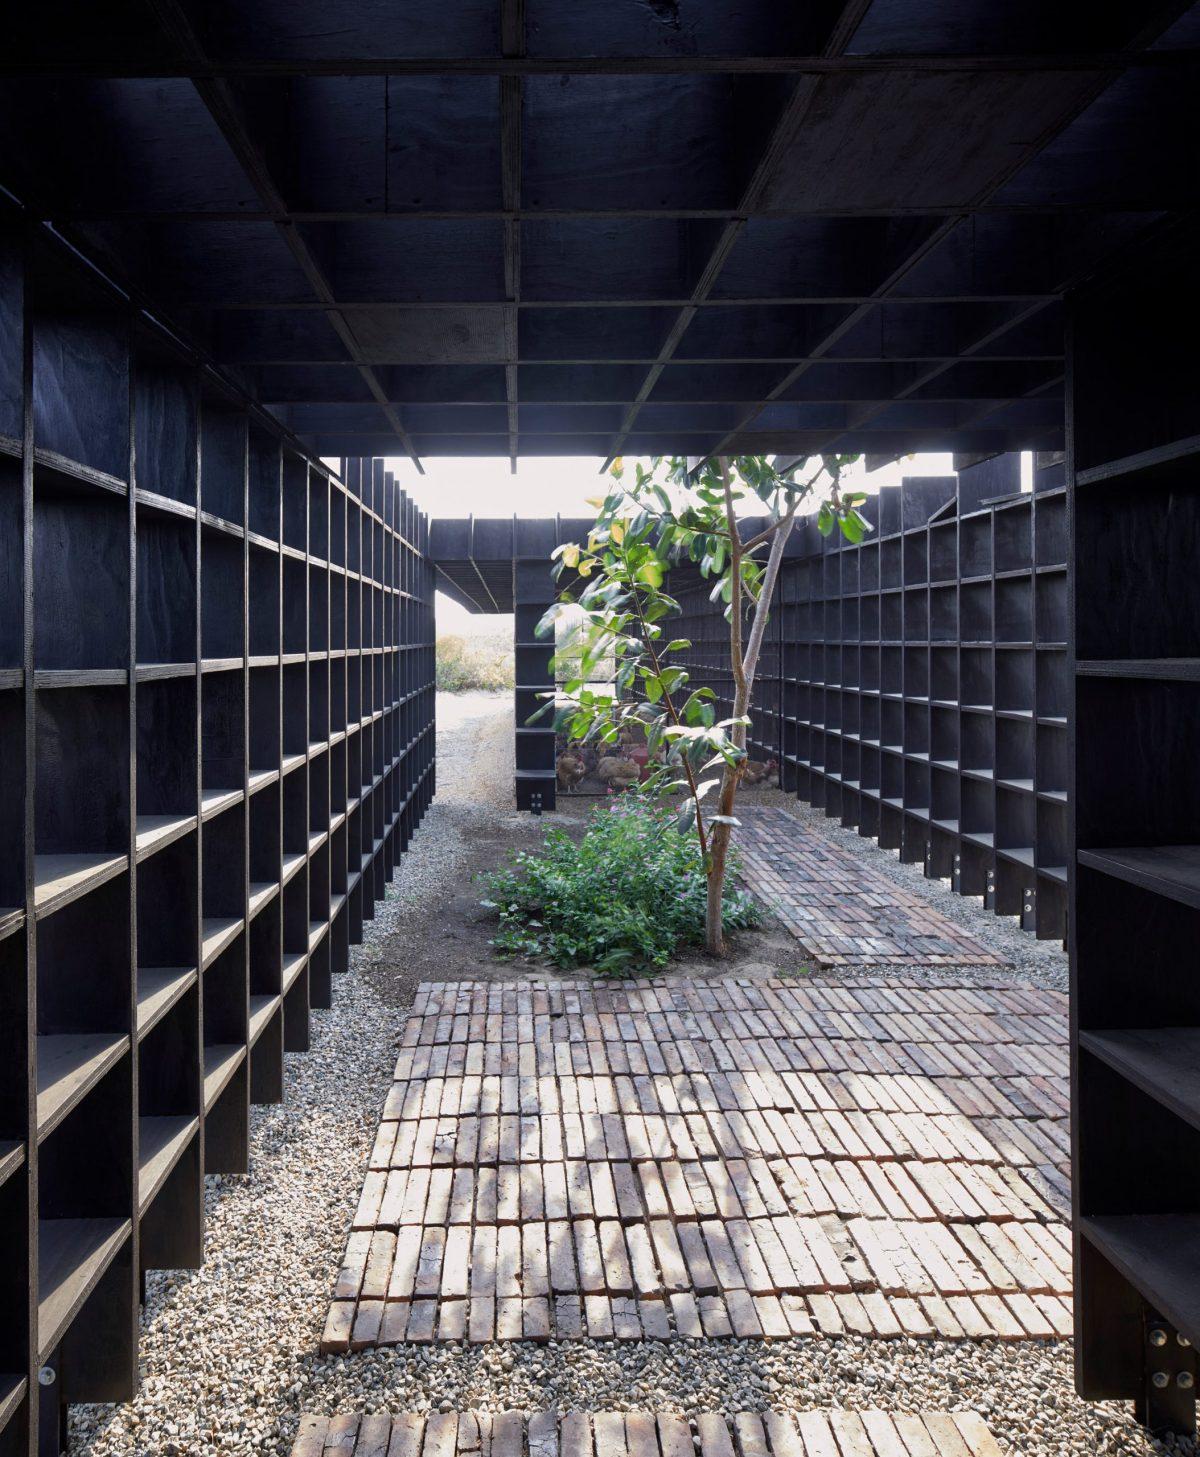 casa-wabi-coop-kengo-kuma-architecture-mexico-9